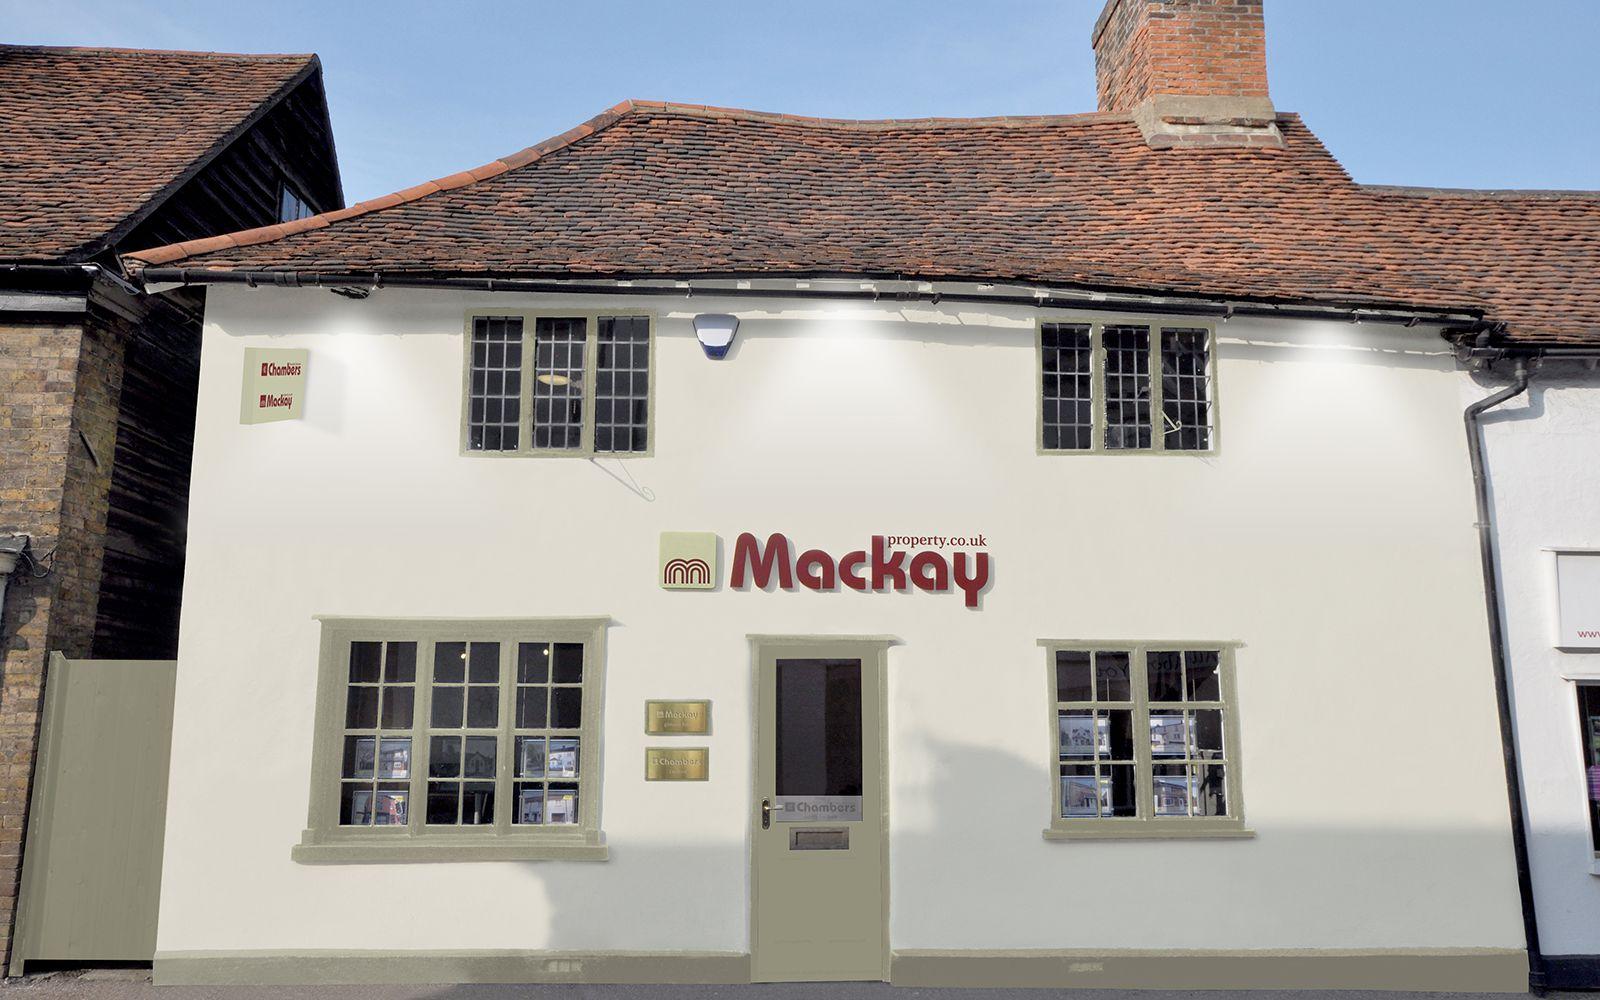 mackay_prepery_office